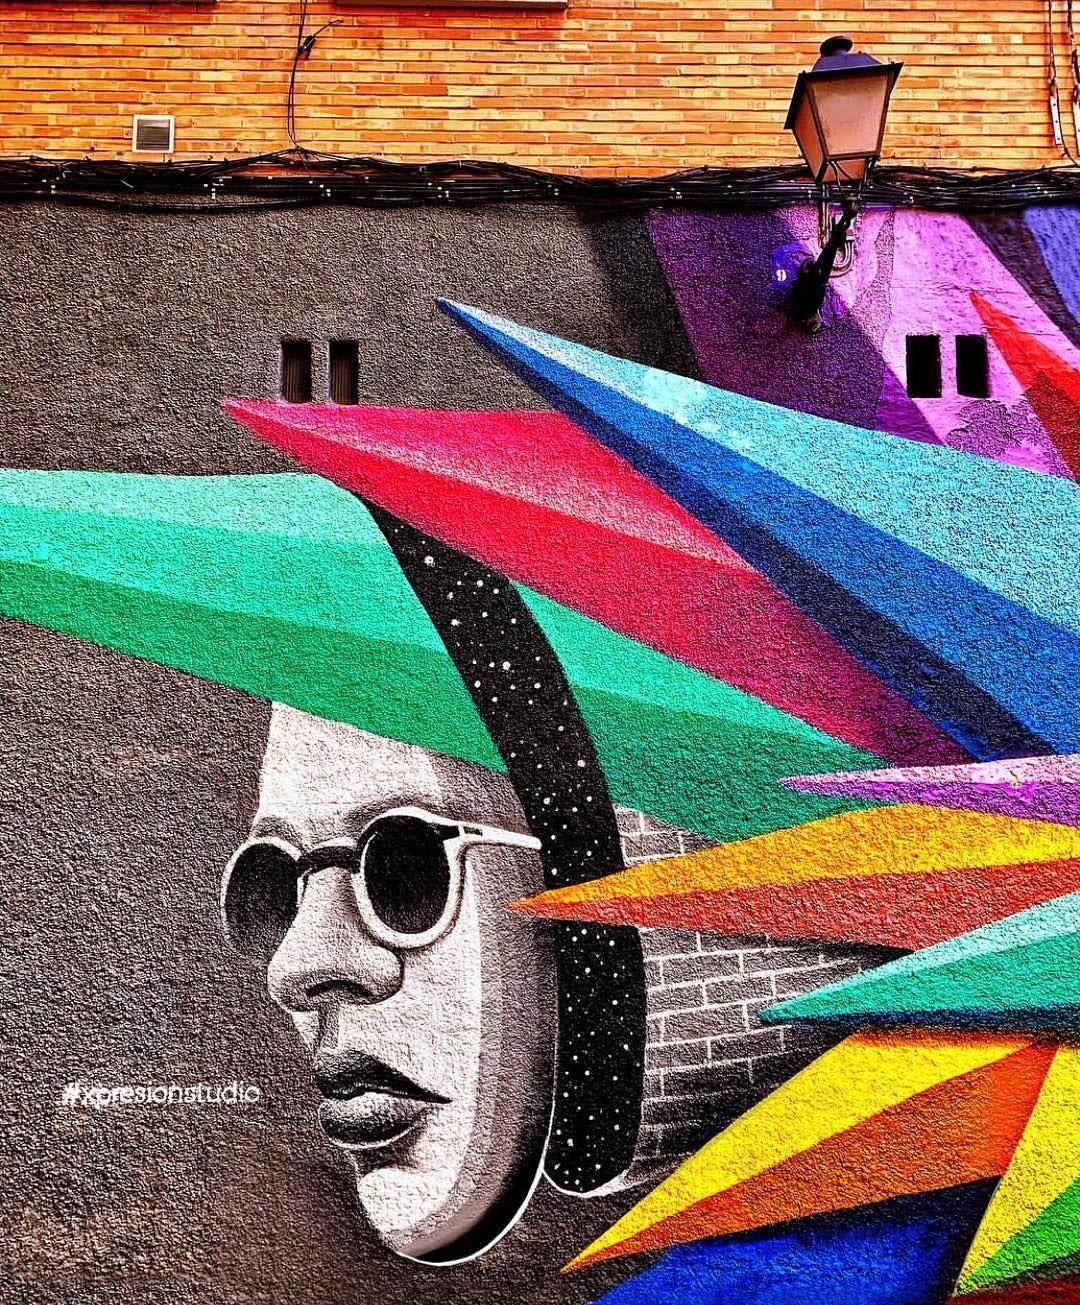 Instagram 39 Da Urban Art Redefined Vibrant Piece Created By World Famous Artist Okuda San Miguel Urban Art World Famous Artists Art